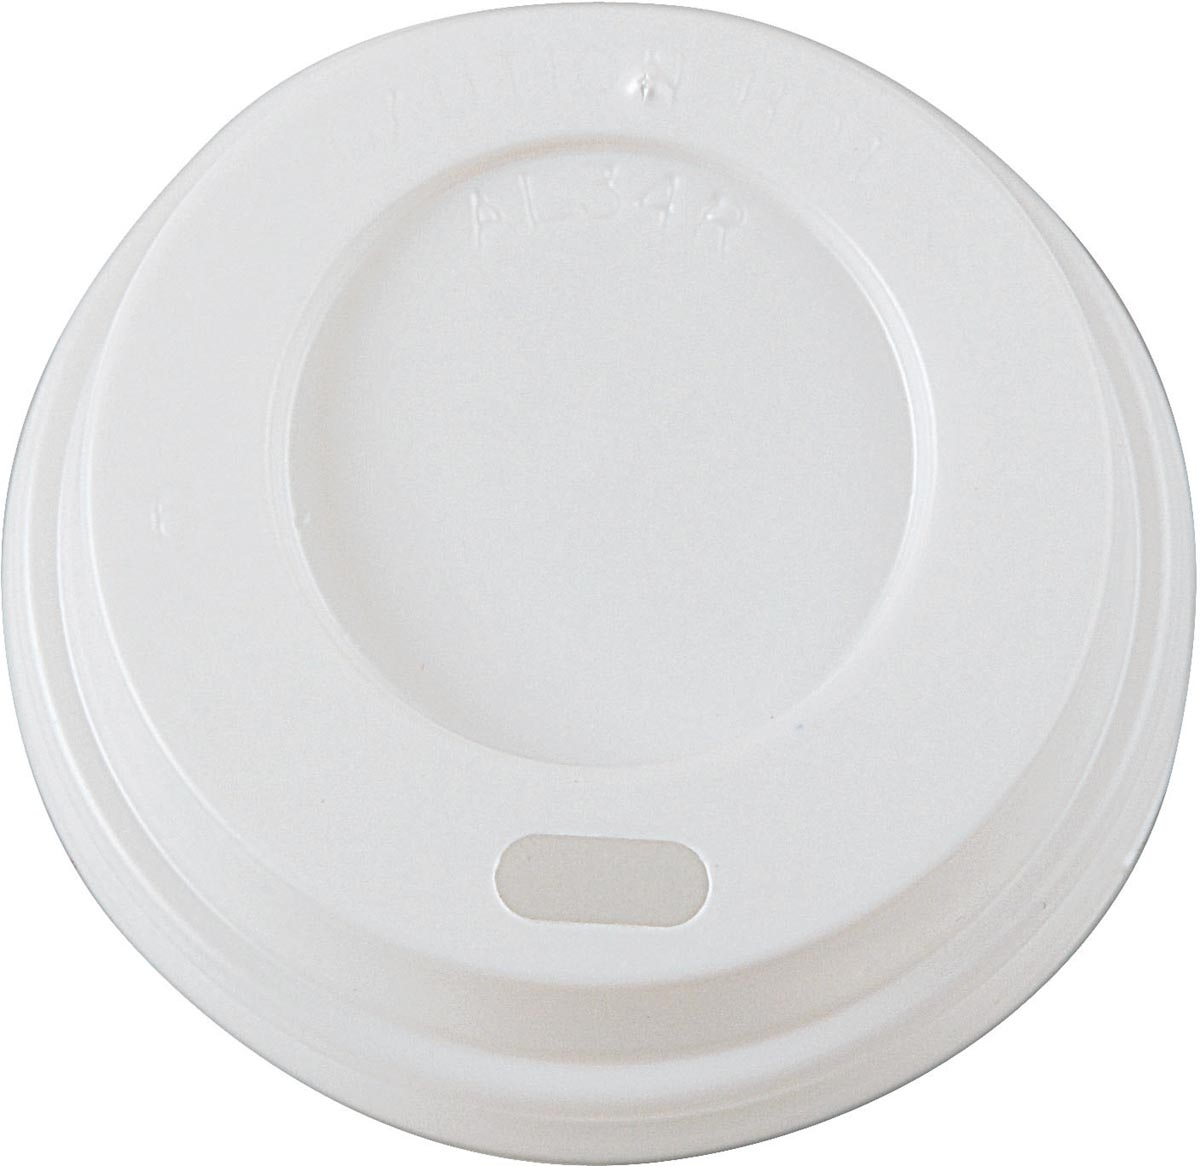 Deksel Coffee To Go, wit, diameter 62,5 mm, pak van 100 stuks